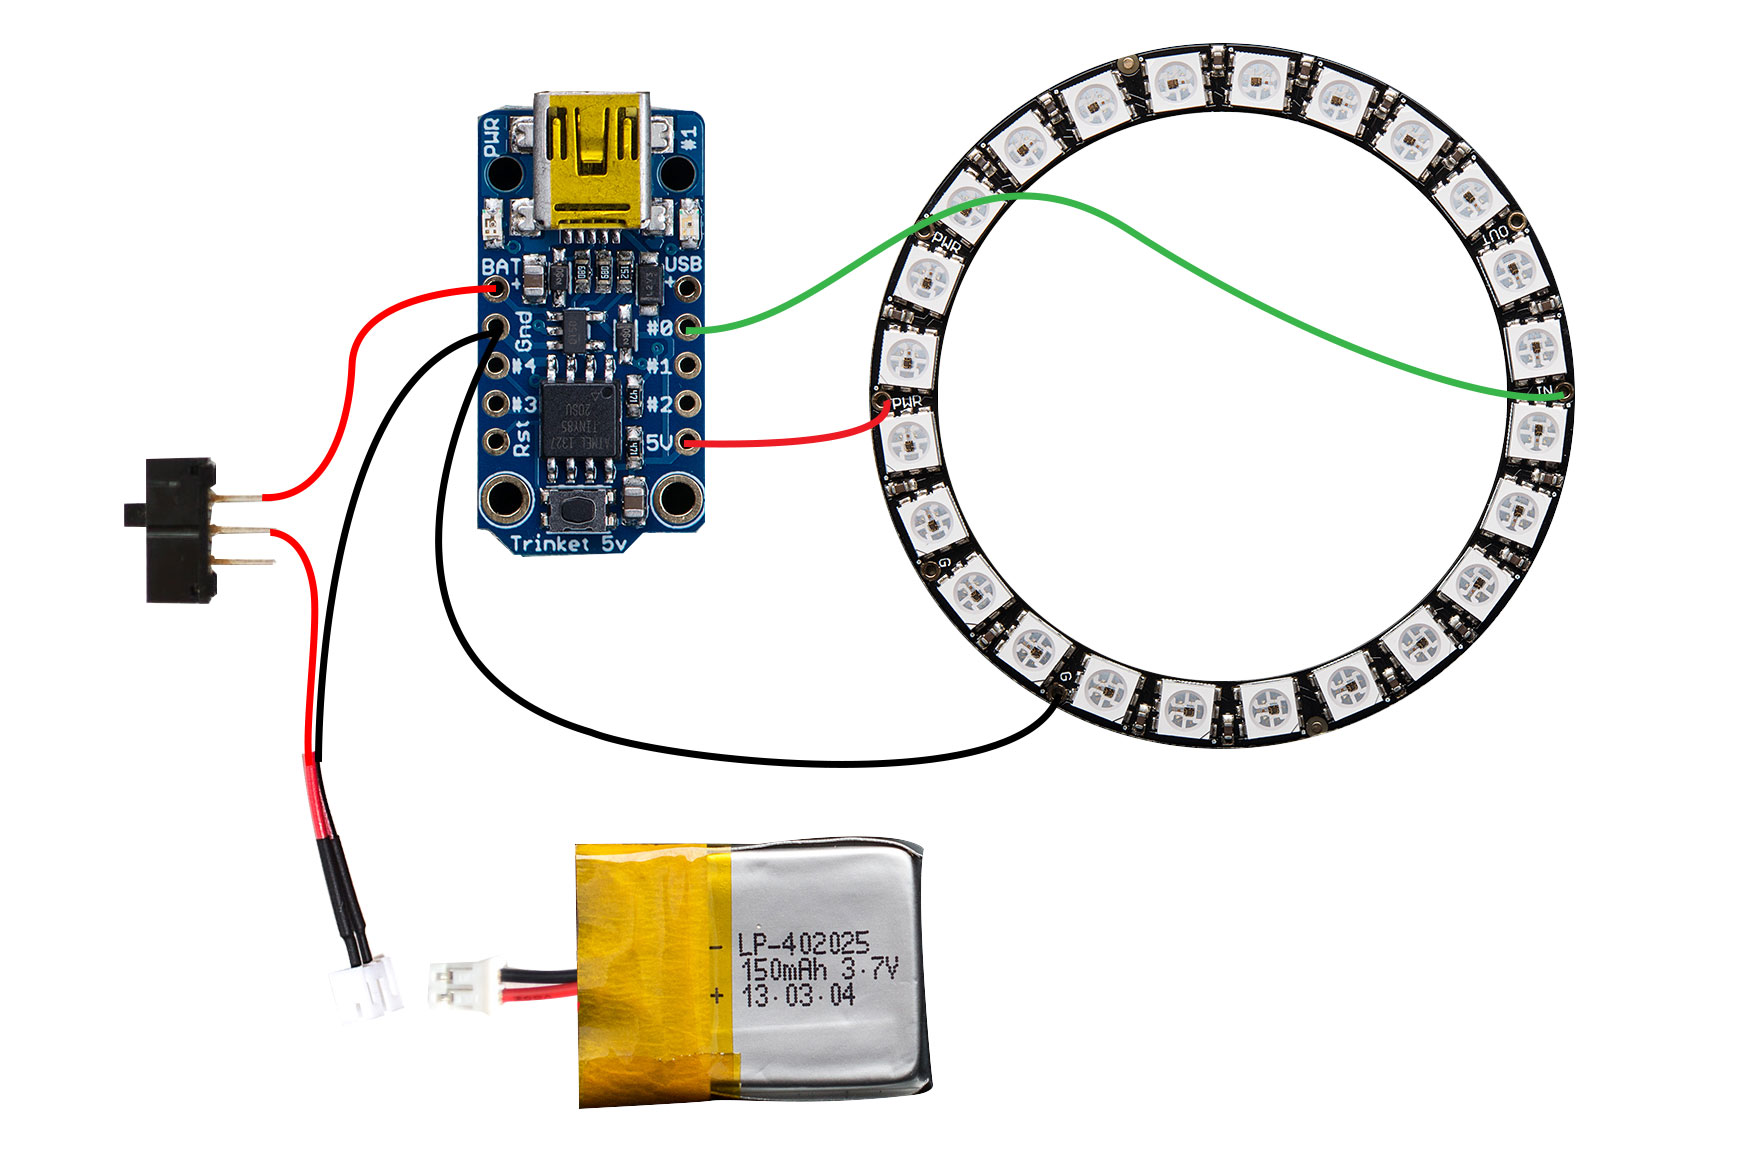 3d_printing_cam-light-rig-Curcuit-Layout.jpg